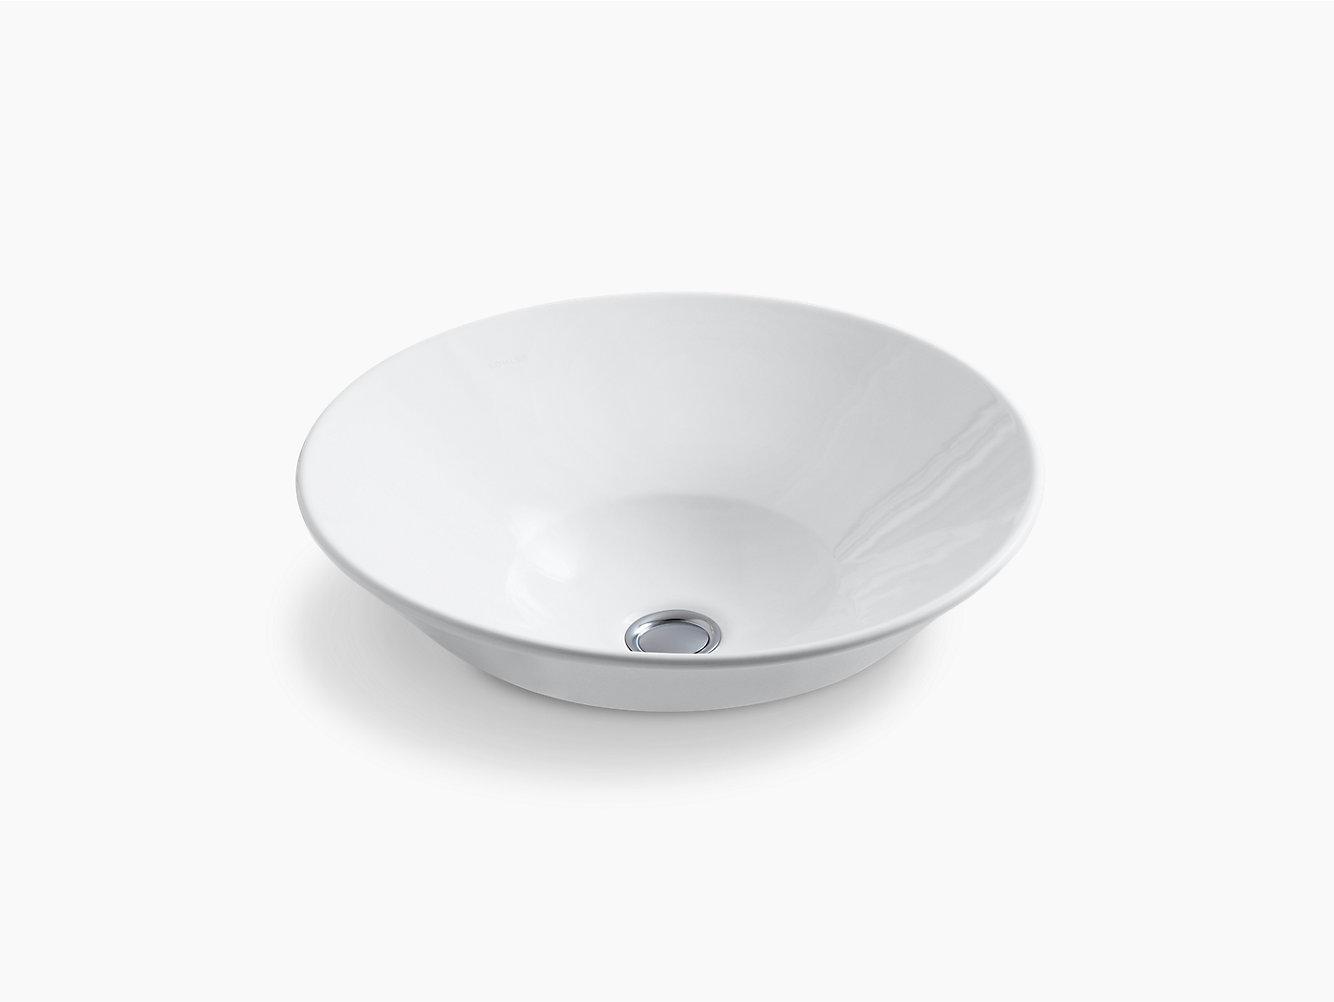 Kohler k 2200 vitreous china lavatory sink contemporary bathroom sinks - View Larger